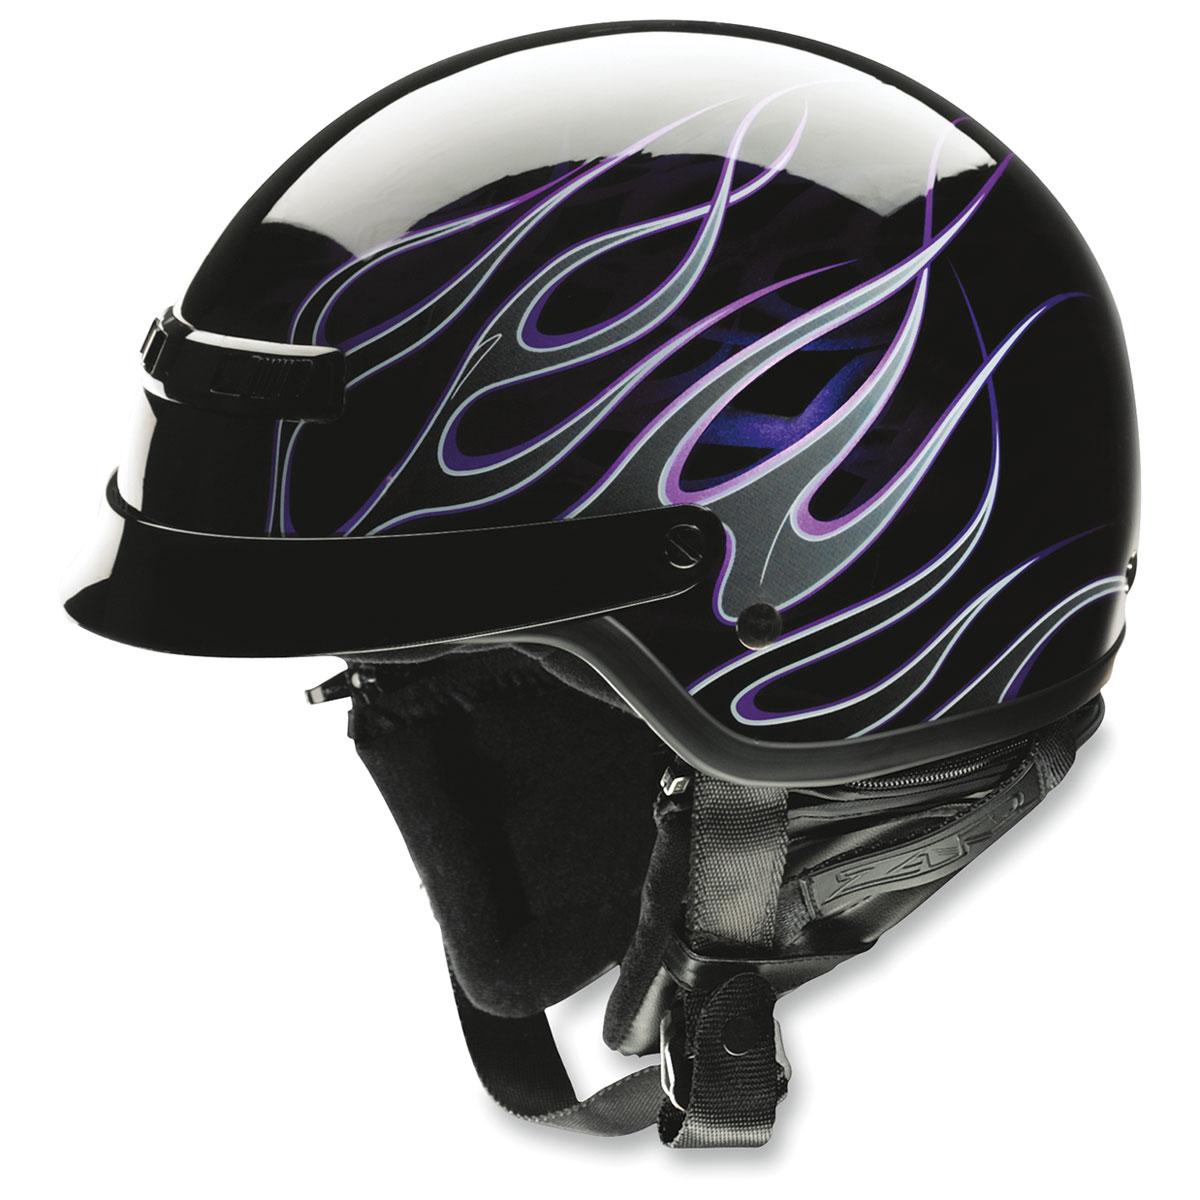 Z1R Nomad Hellfire Black/Purple Half Helmet